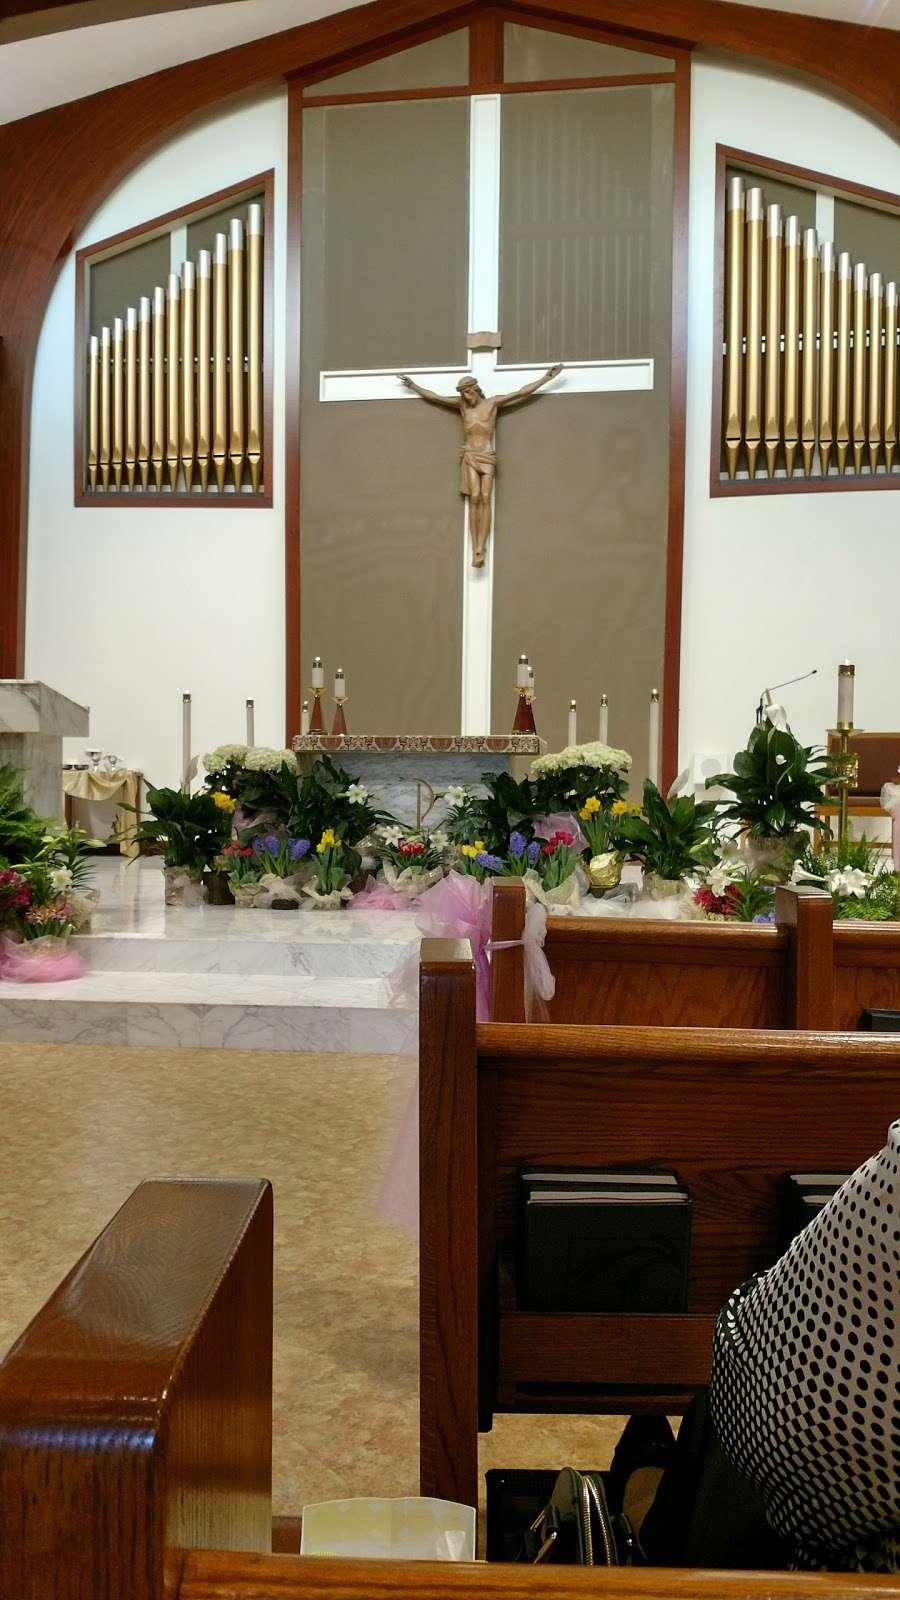 St. Margarets of Cortona Church - church  | Photo 1 of 10 | Address: 31 Chamberlain Ave, Little Ferry, NJ 07643, USA | Phone: (201) 641-2988